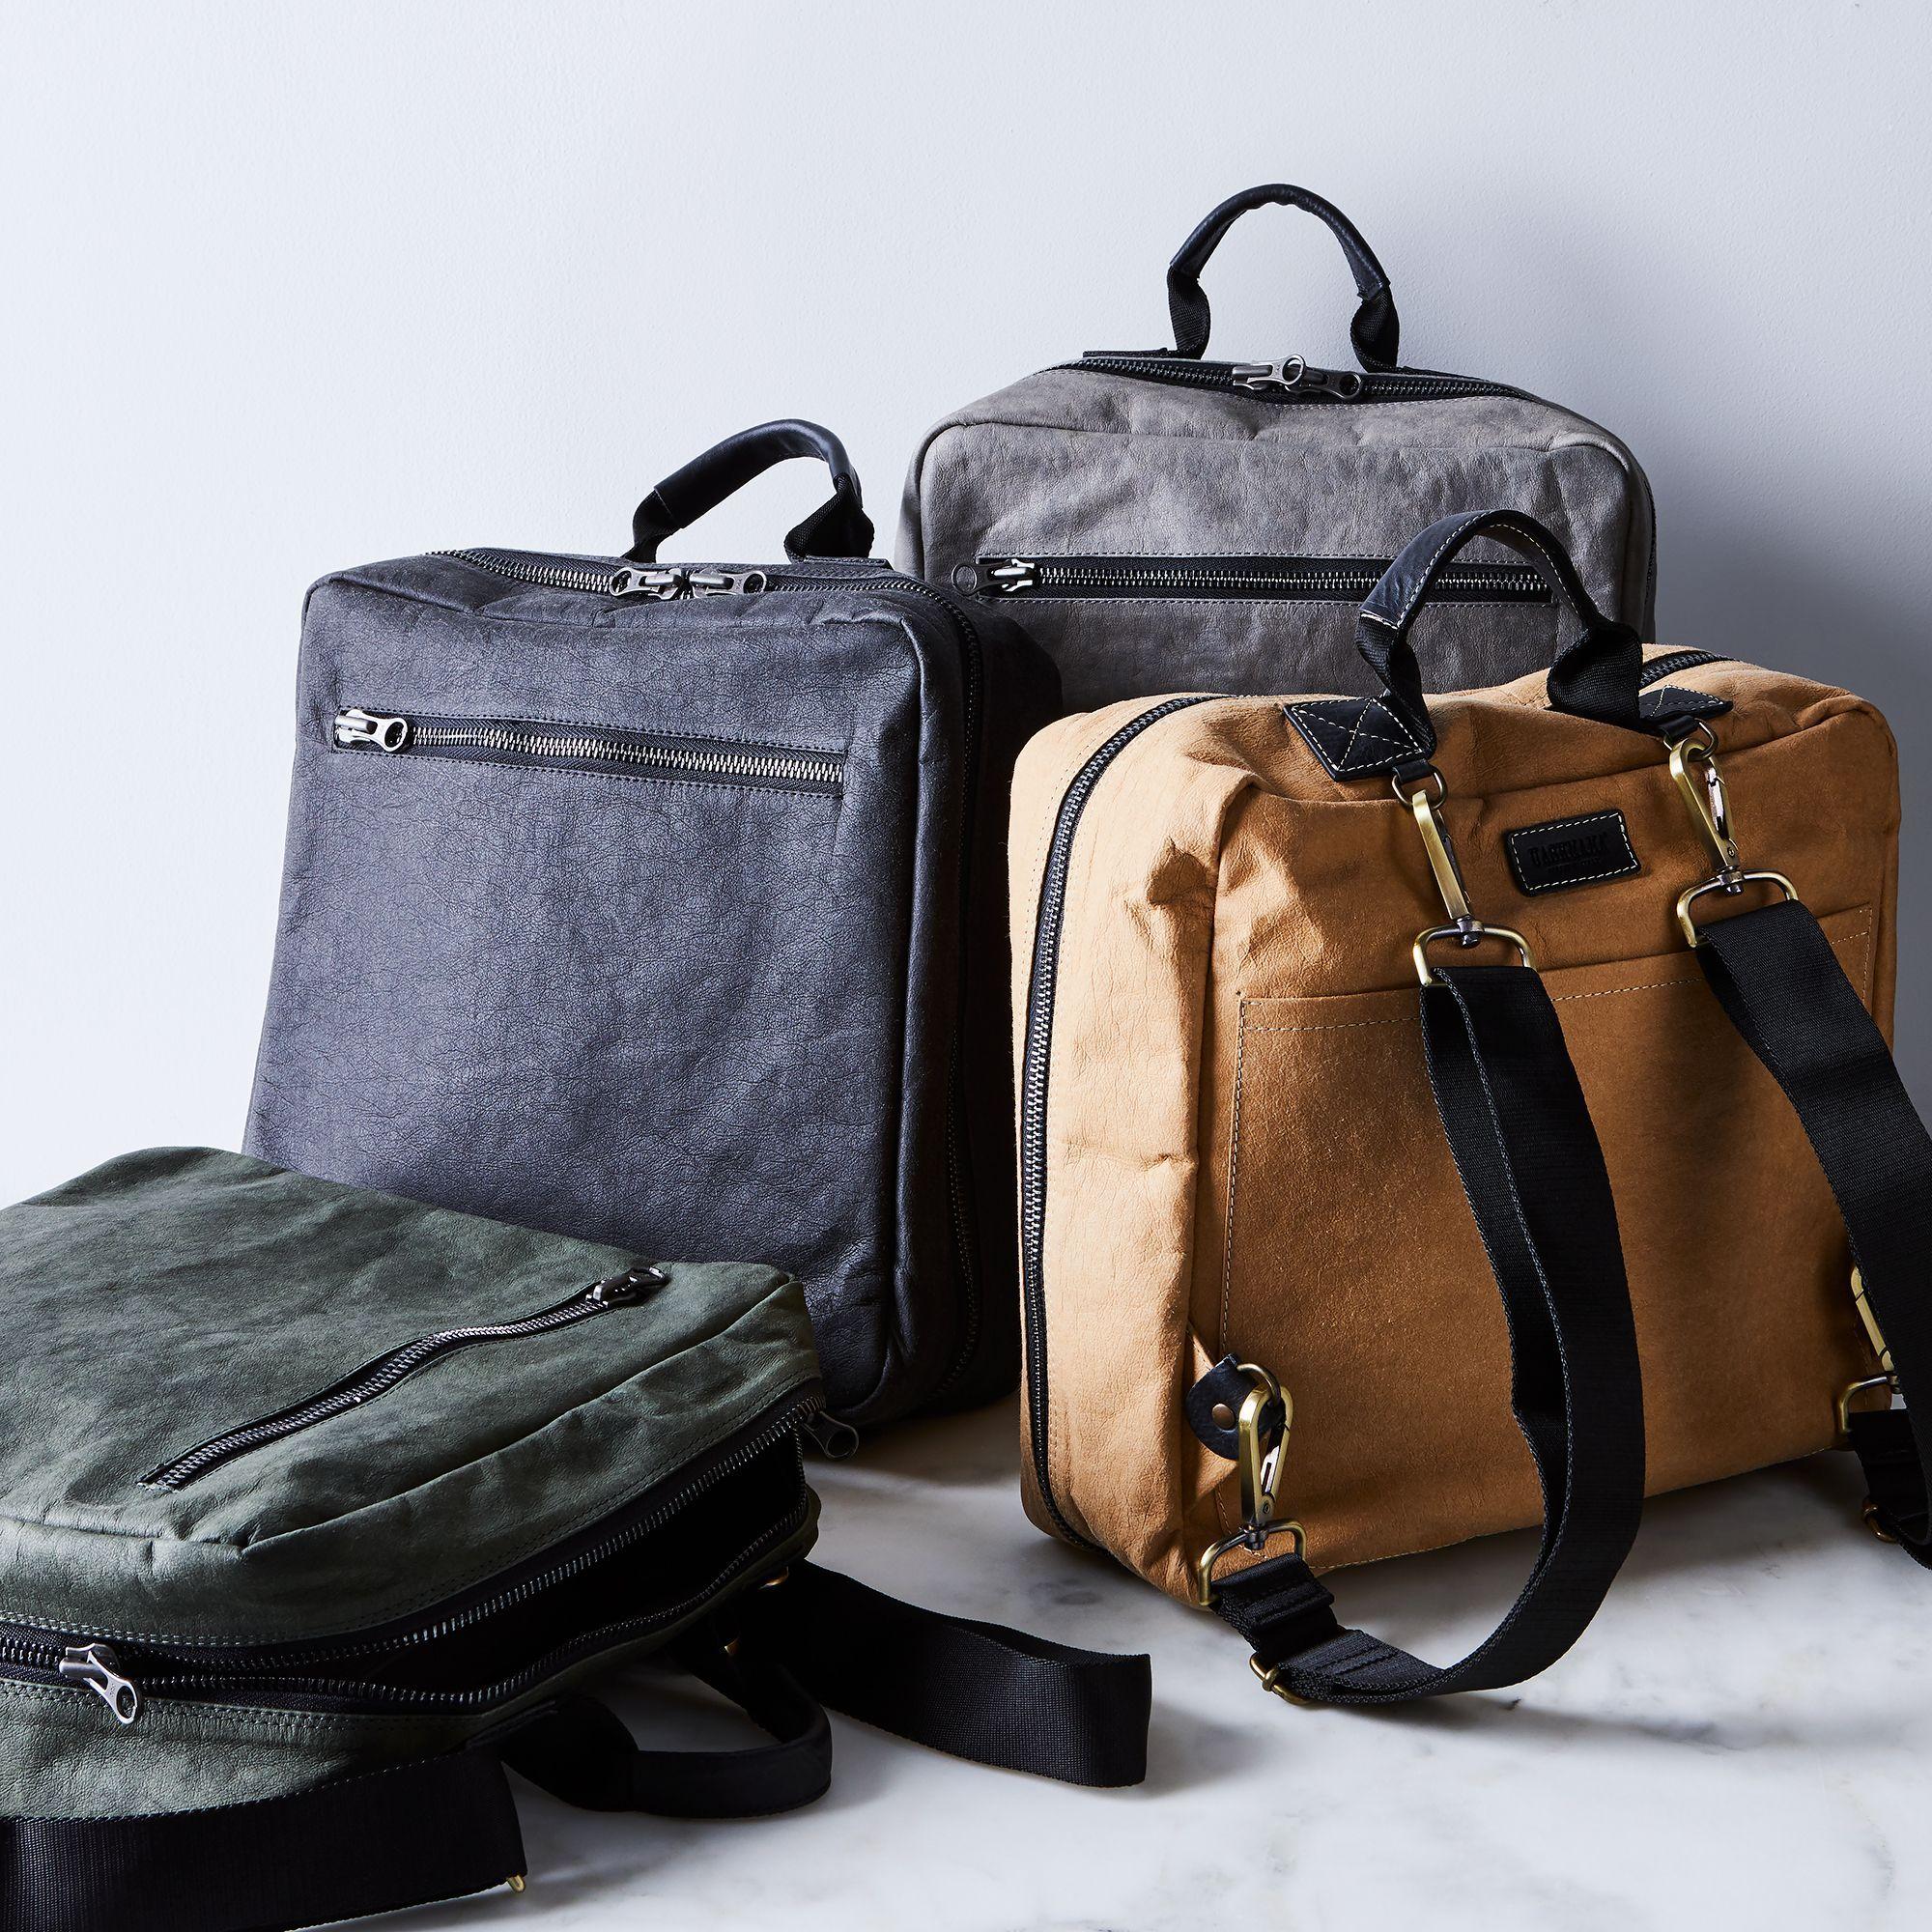 Picnic Backpack Picnic Backpack Duffel Bag Travel Backpacks